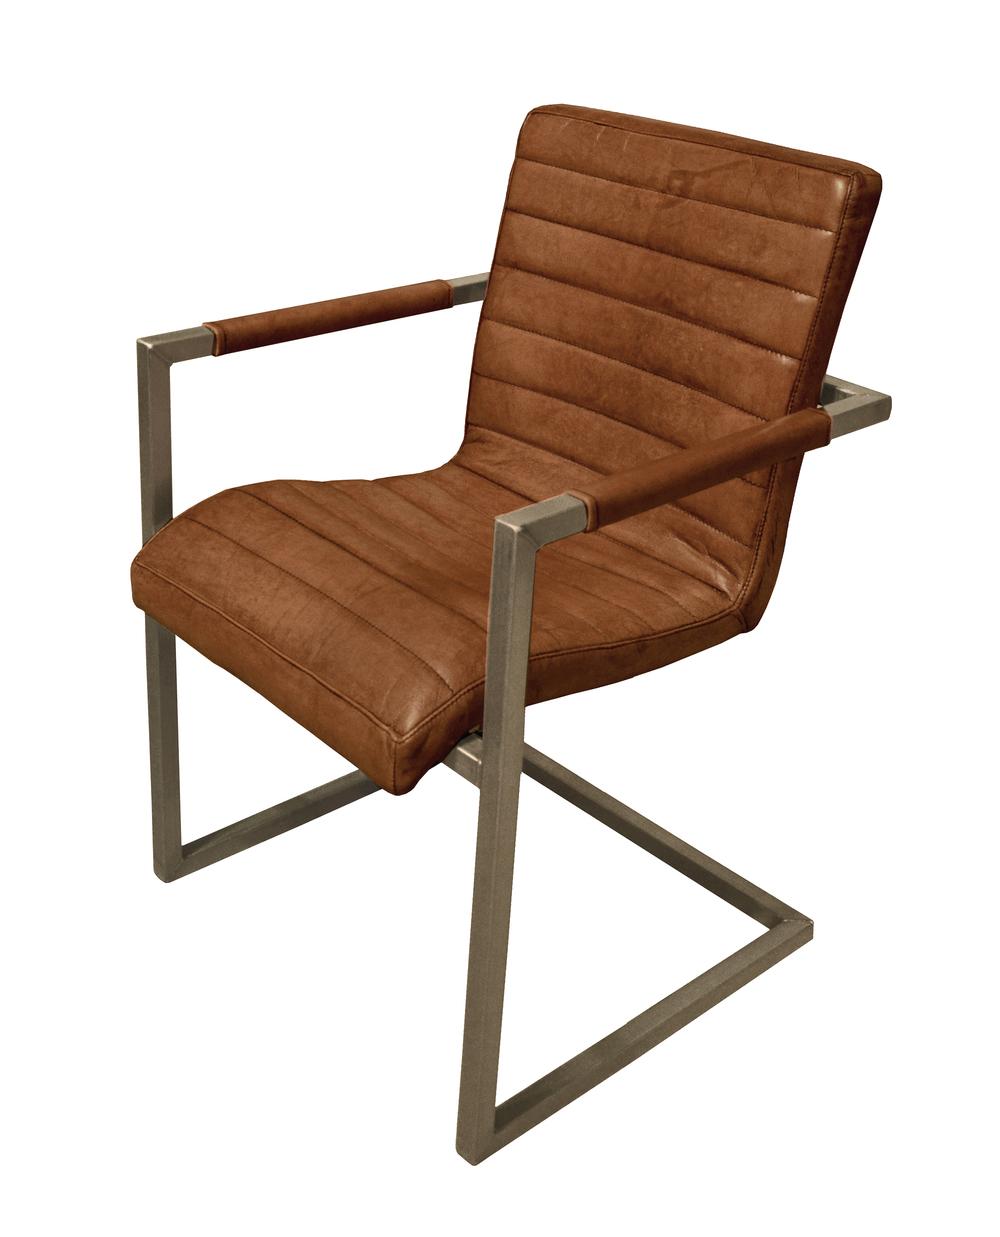 GJ Styles - Sabina Arm Chair, Light Brown Buffalo